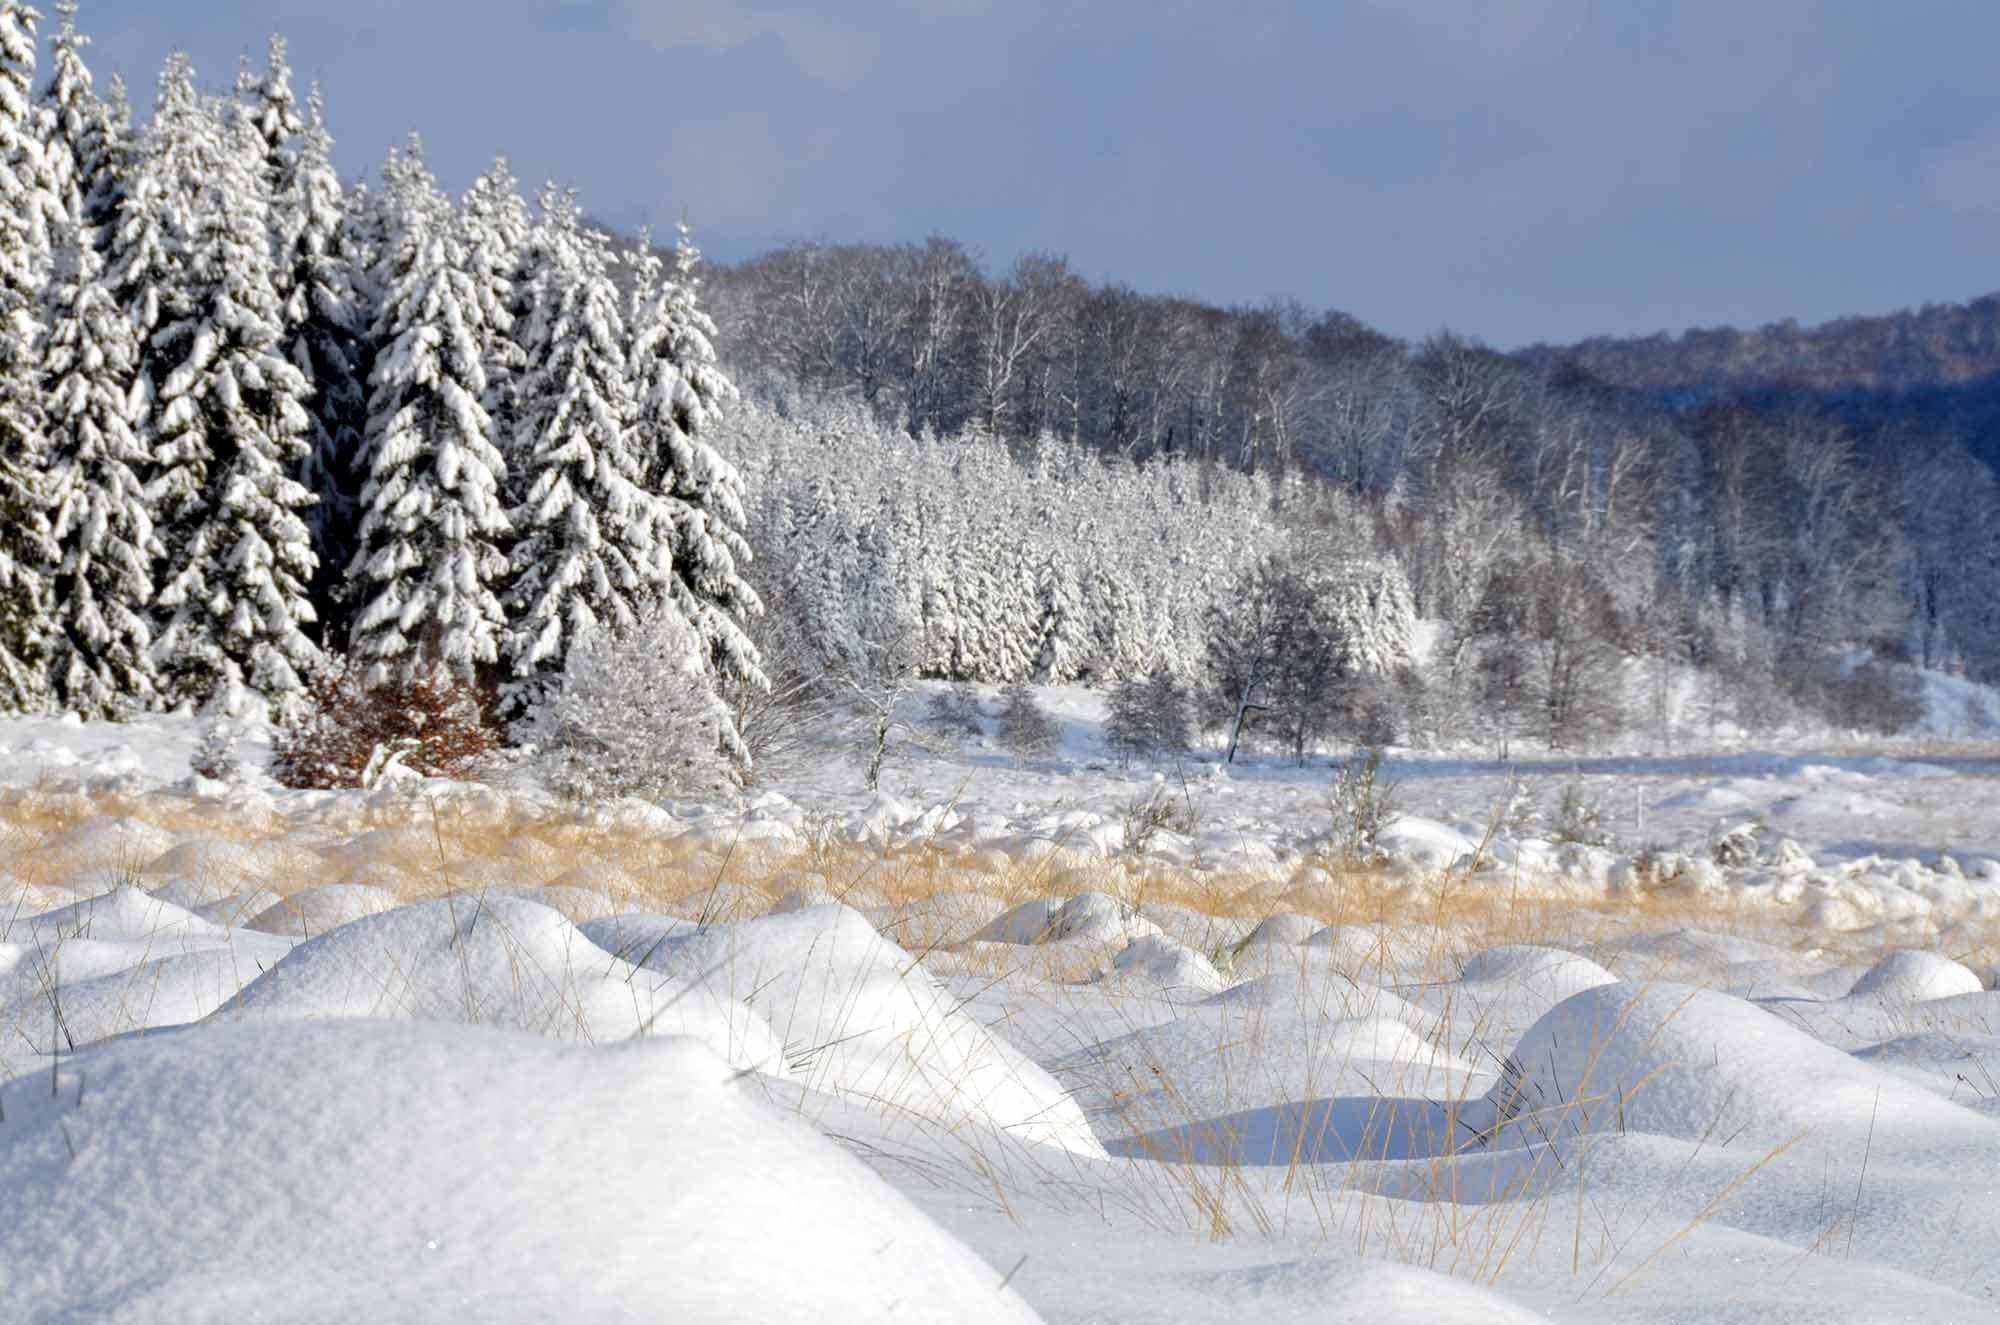 ardenne residences saint-hubert 6870 region landscapes fens winter